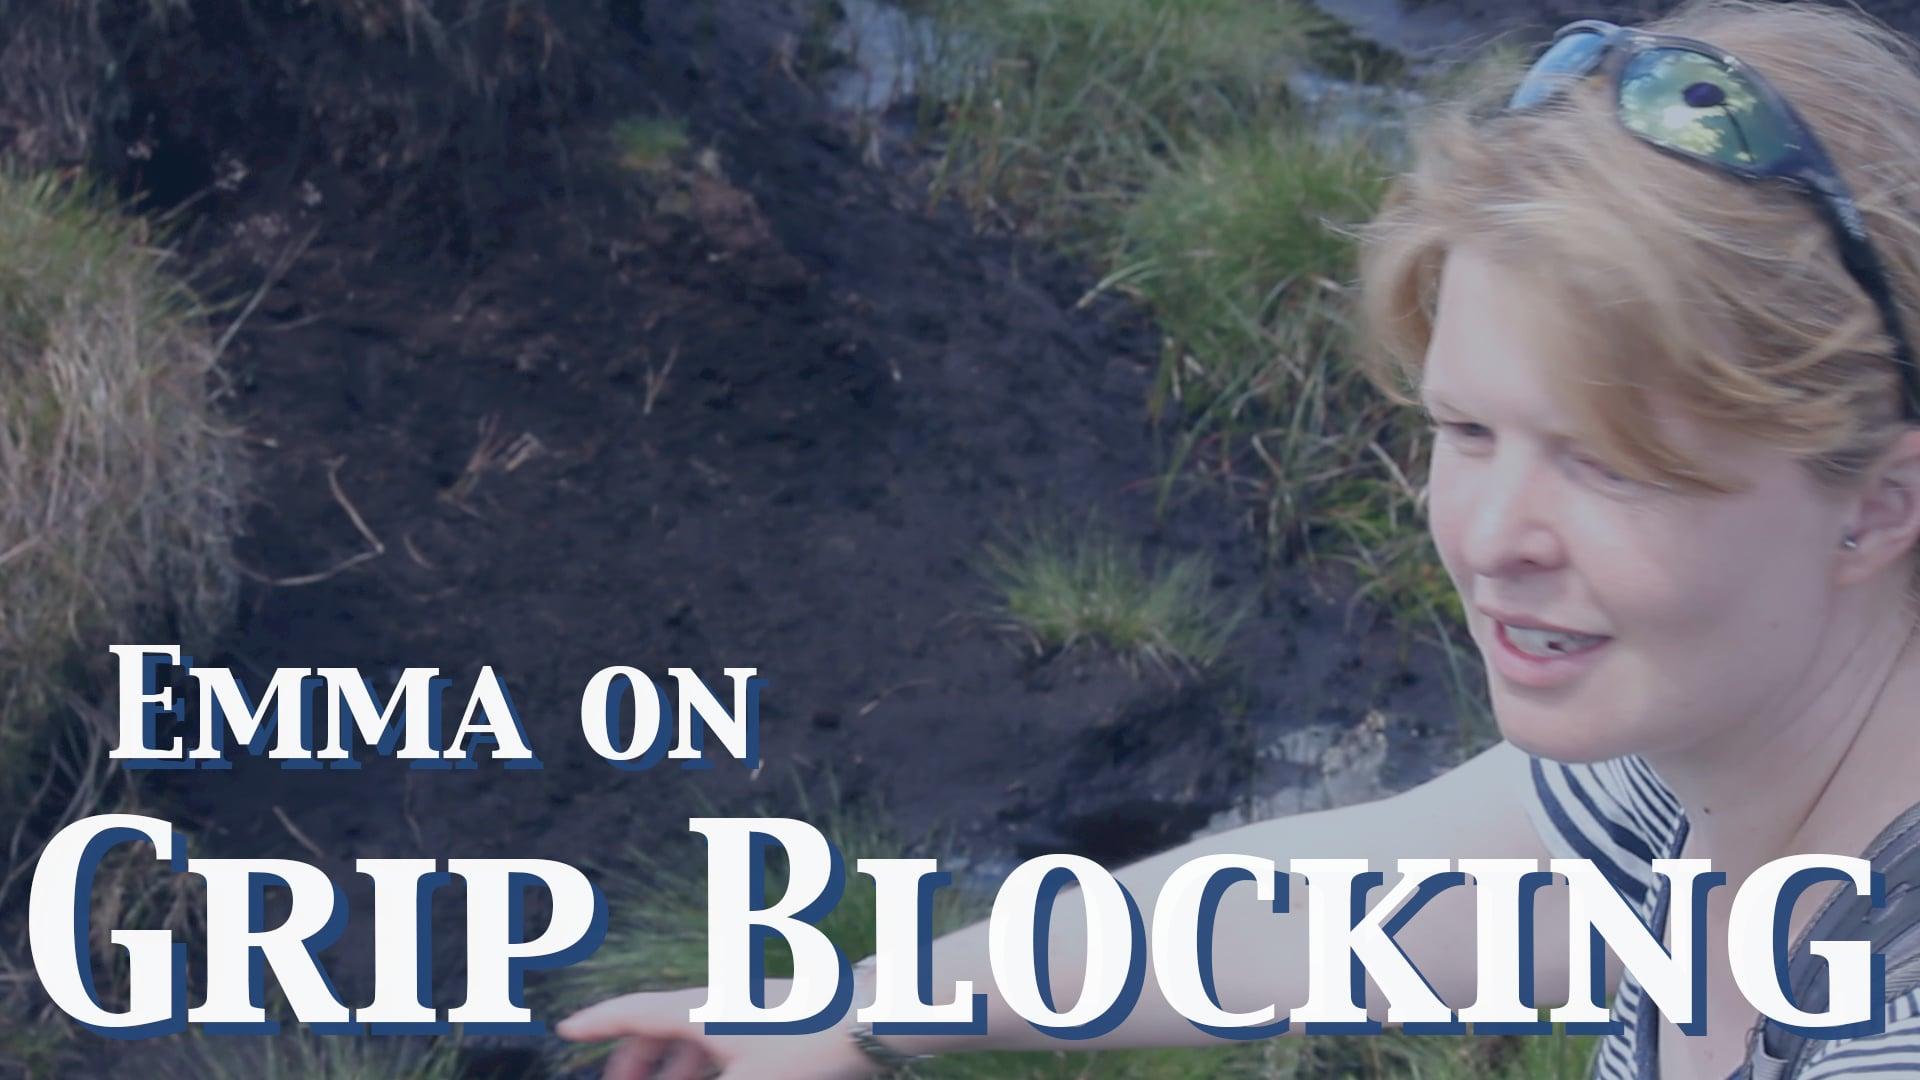 Emma on Grip Blocking